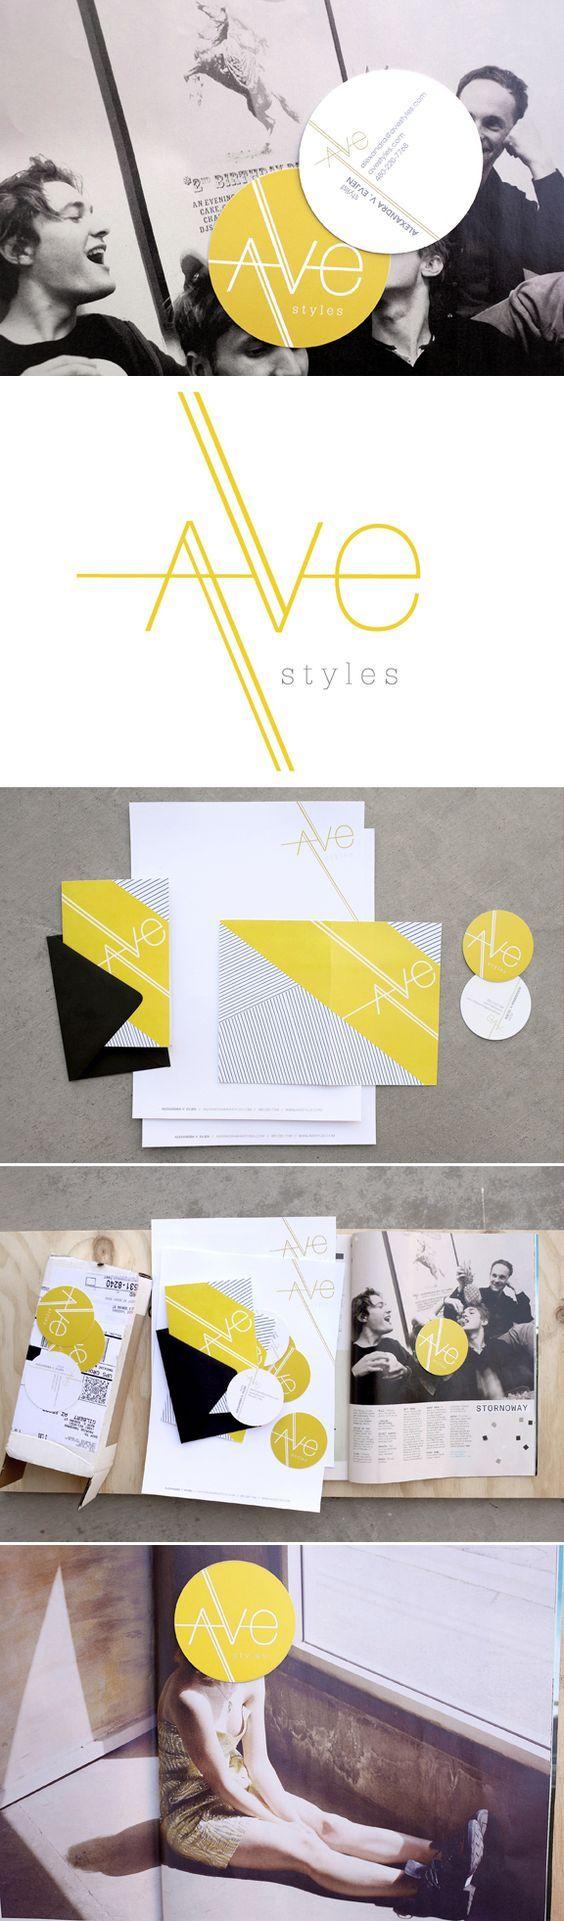 Ave Styles Branding | Fivestar Branding – Design and Branding Agency & Inspiration Gallery